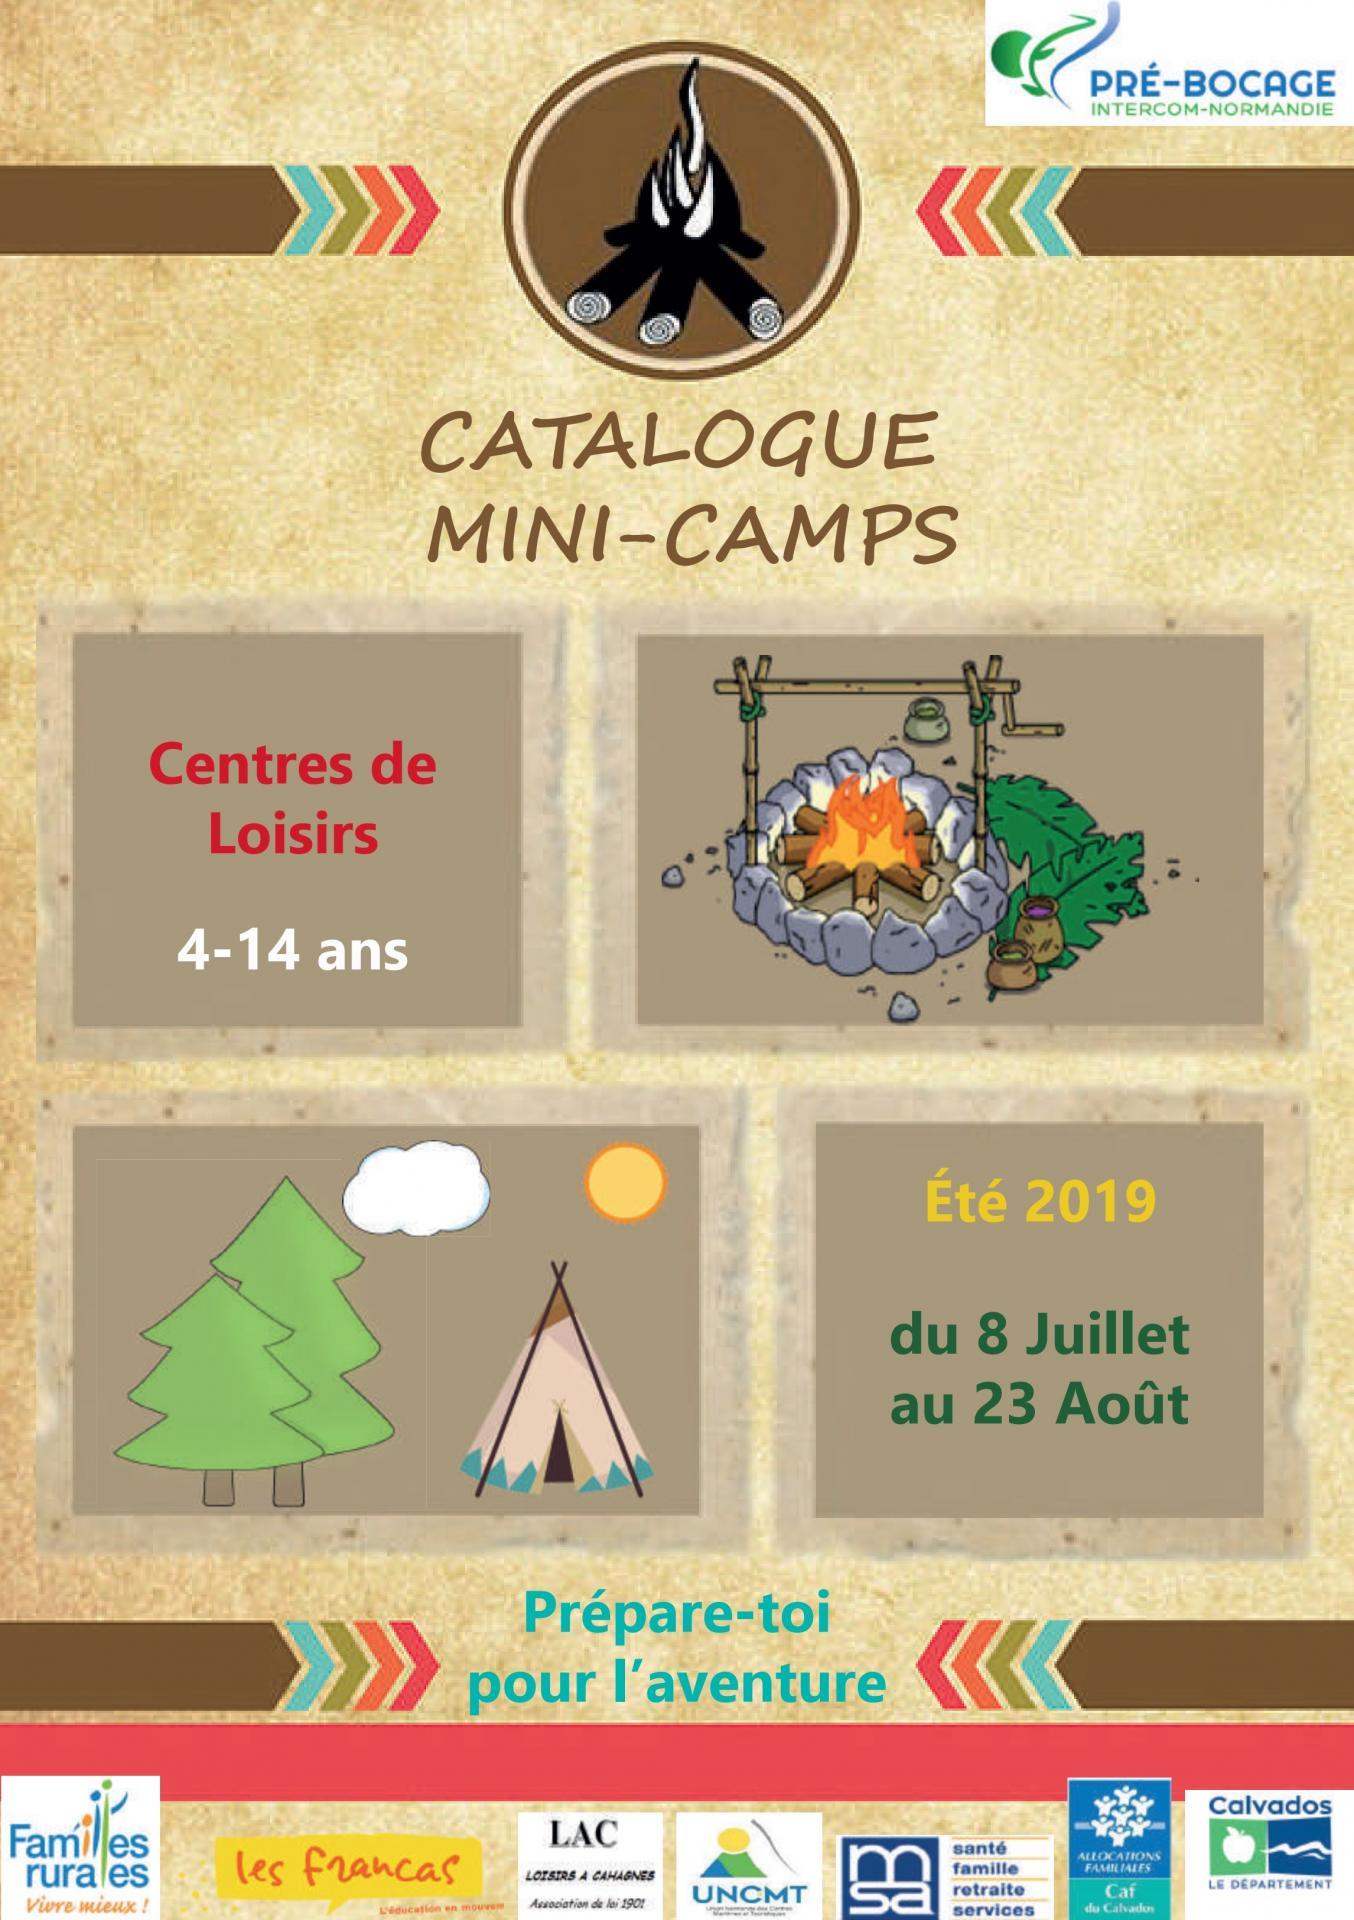 Catalogue mini camps une